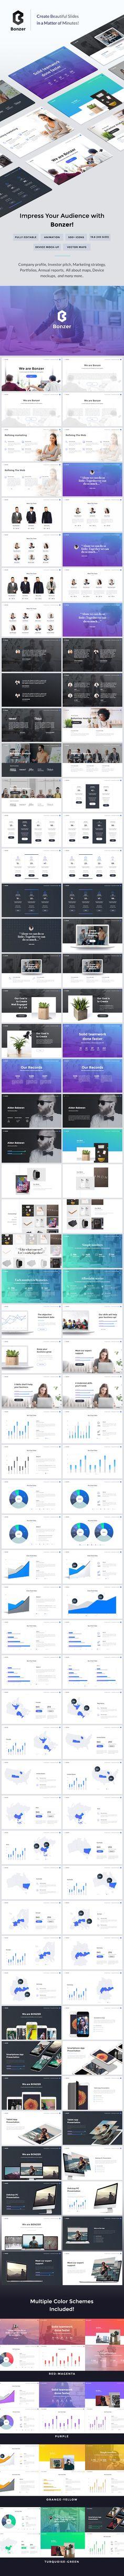 Bonzer  Creative Keynote Template #professional #keynote • Download ➝ https://graphicriver.net/item/bonzer-creative-keynote-template/19448020?ref=pxcr